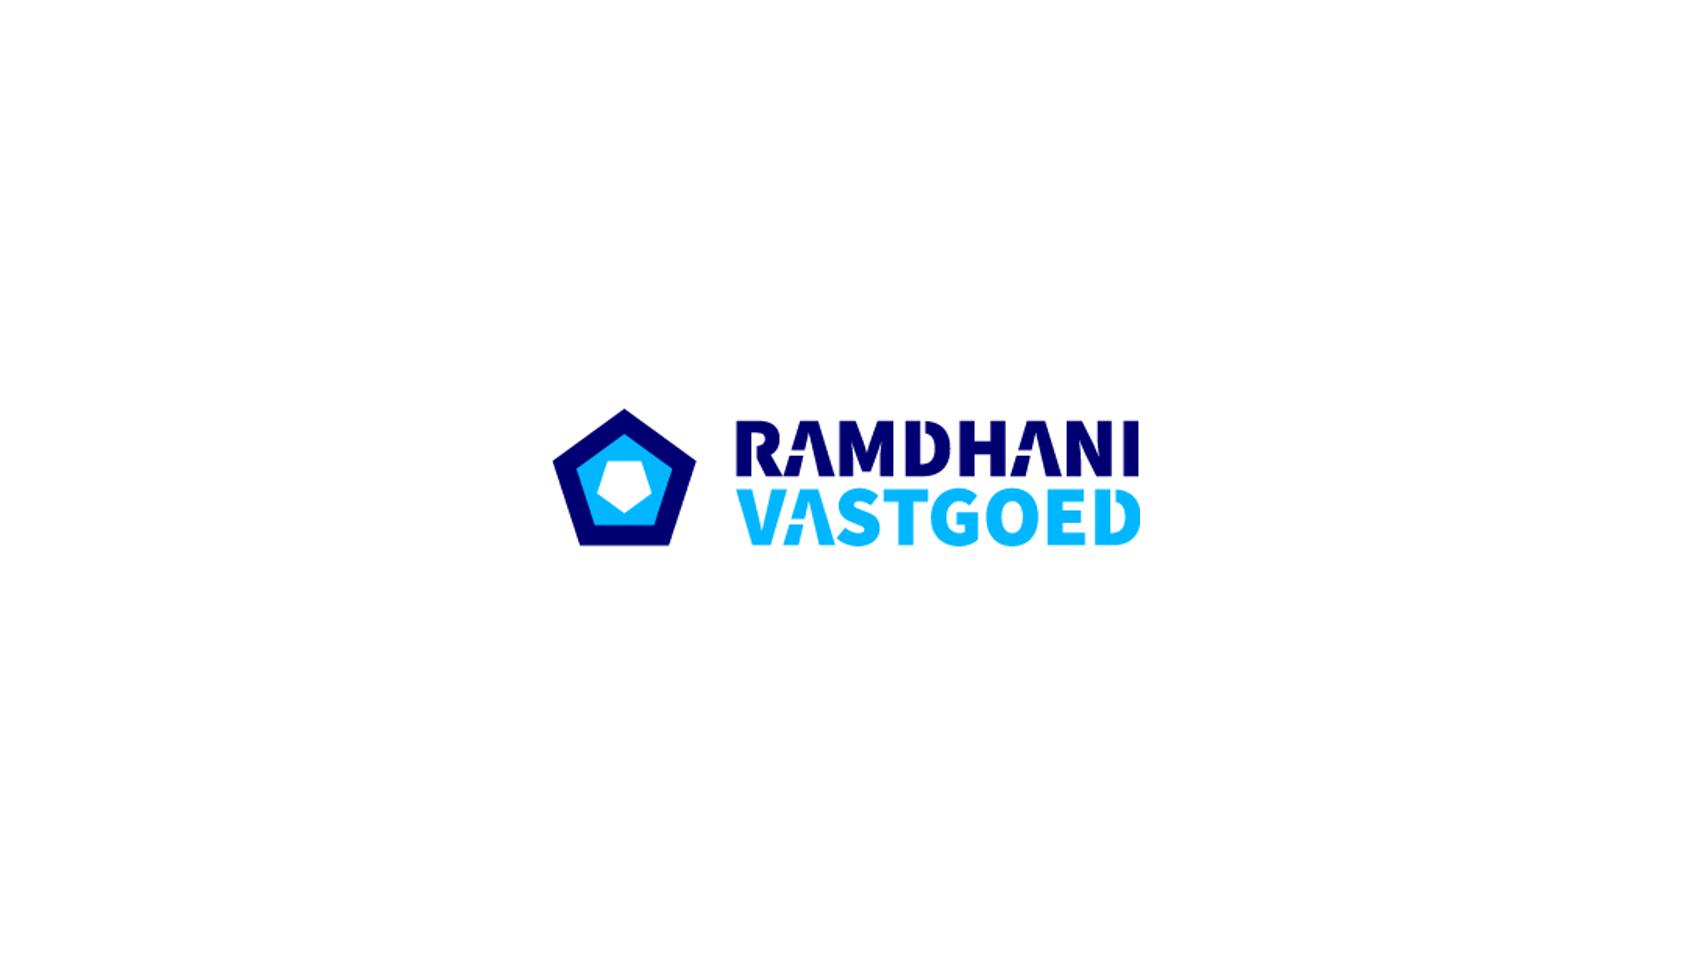 Ramdhani Vastgoed